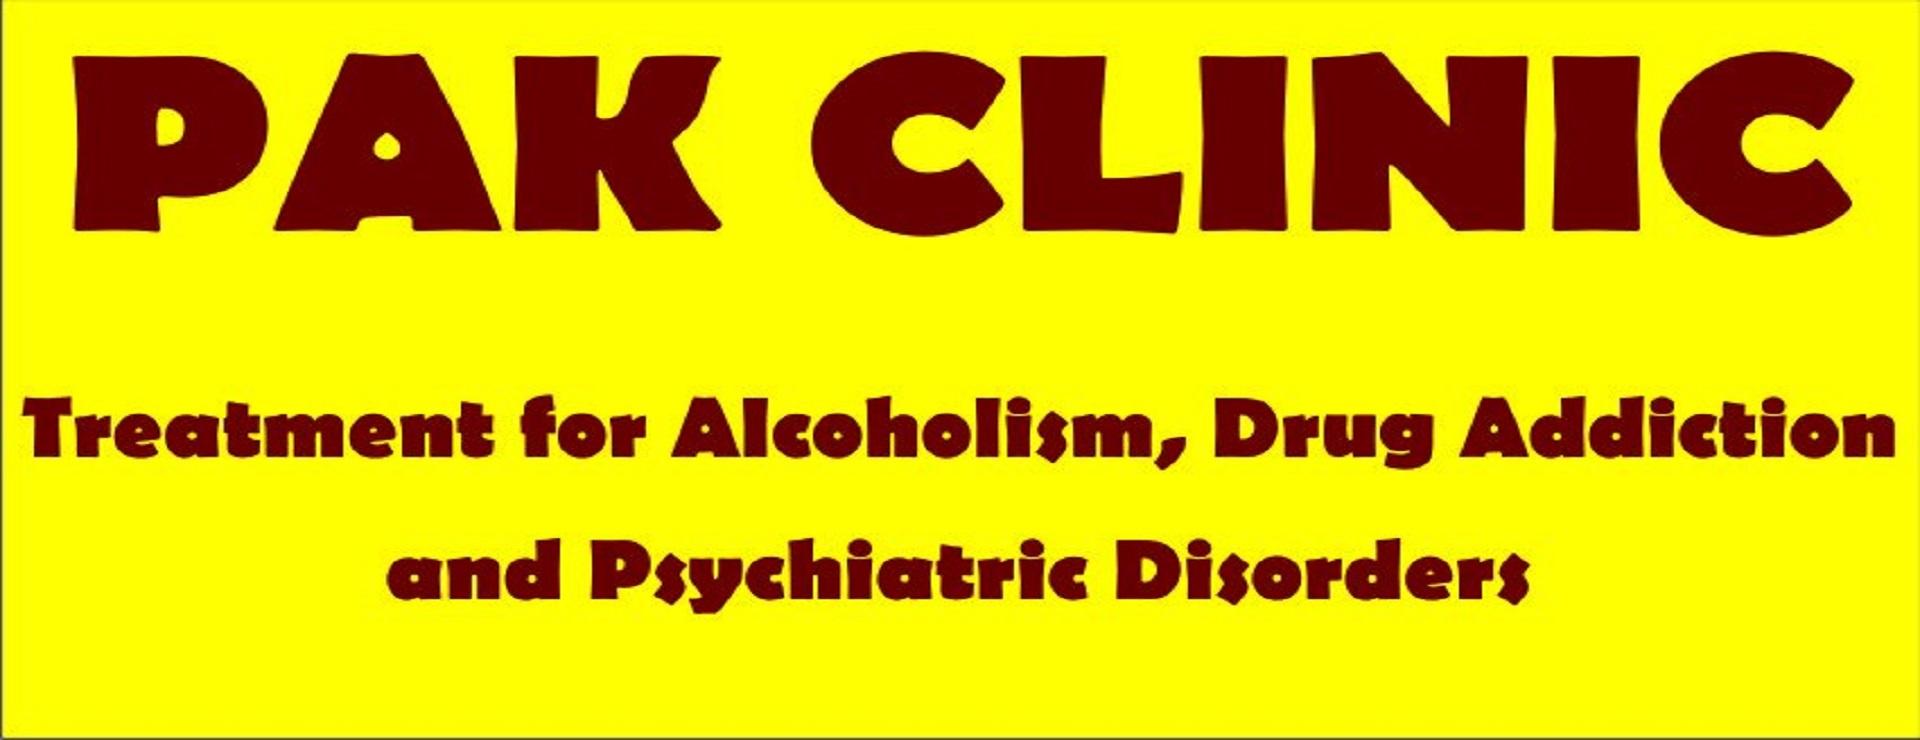 Pak clinic over